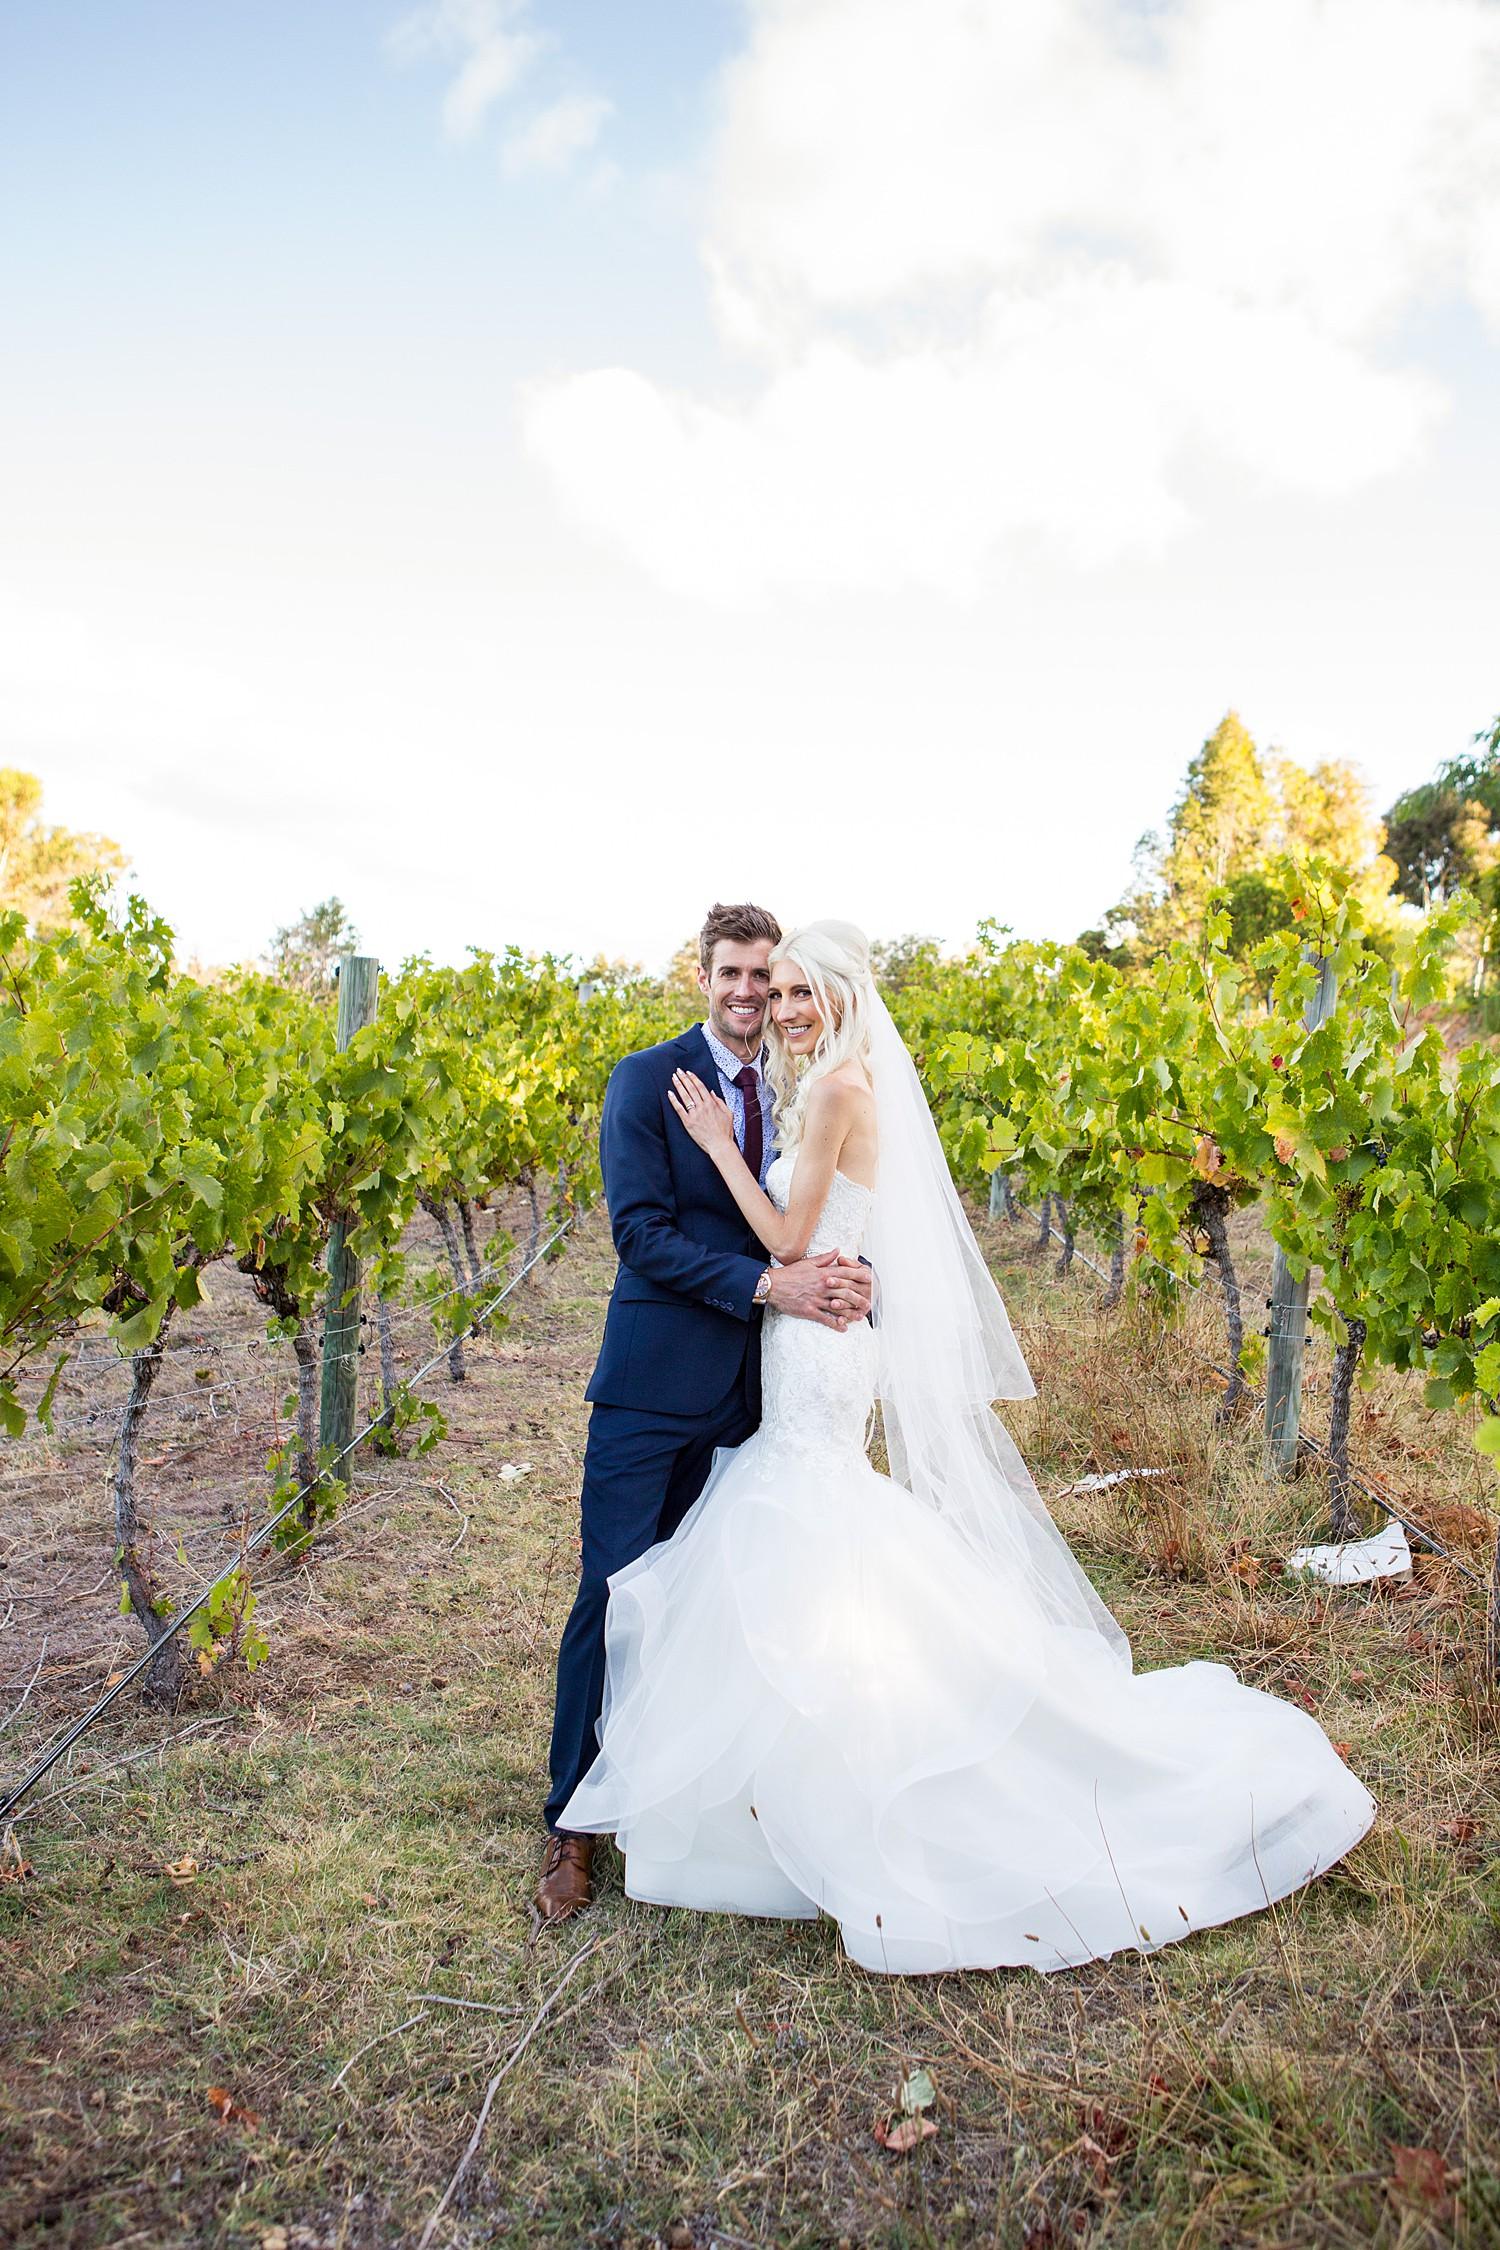 wise_wines_southwest_WA_wedding_0092.jpg